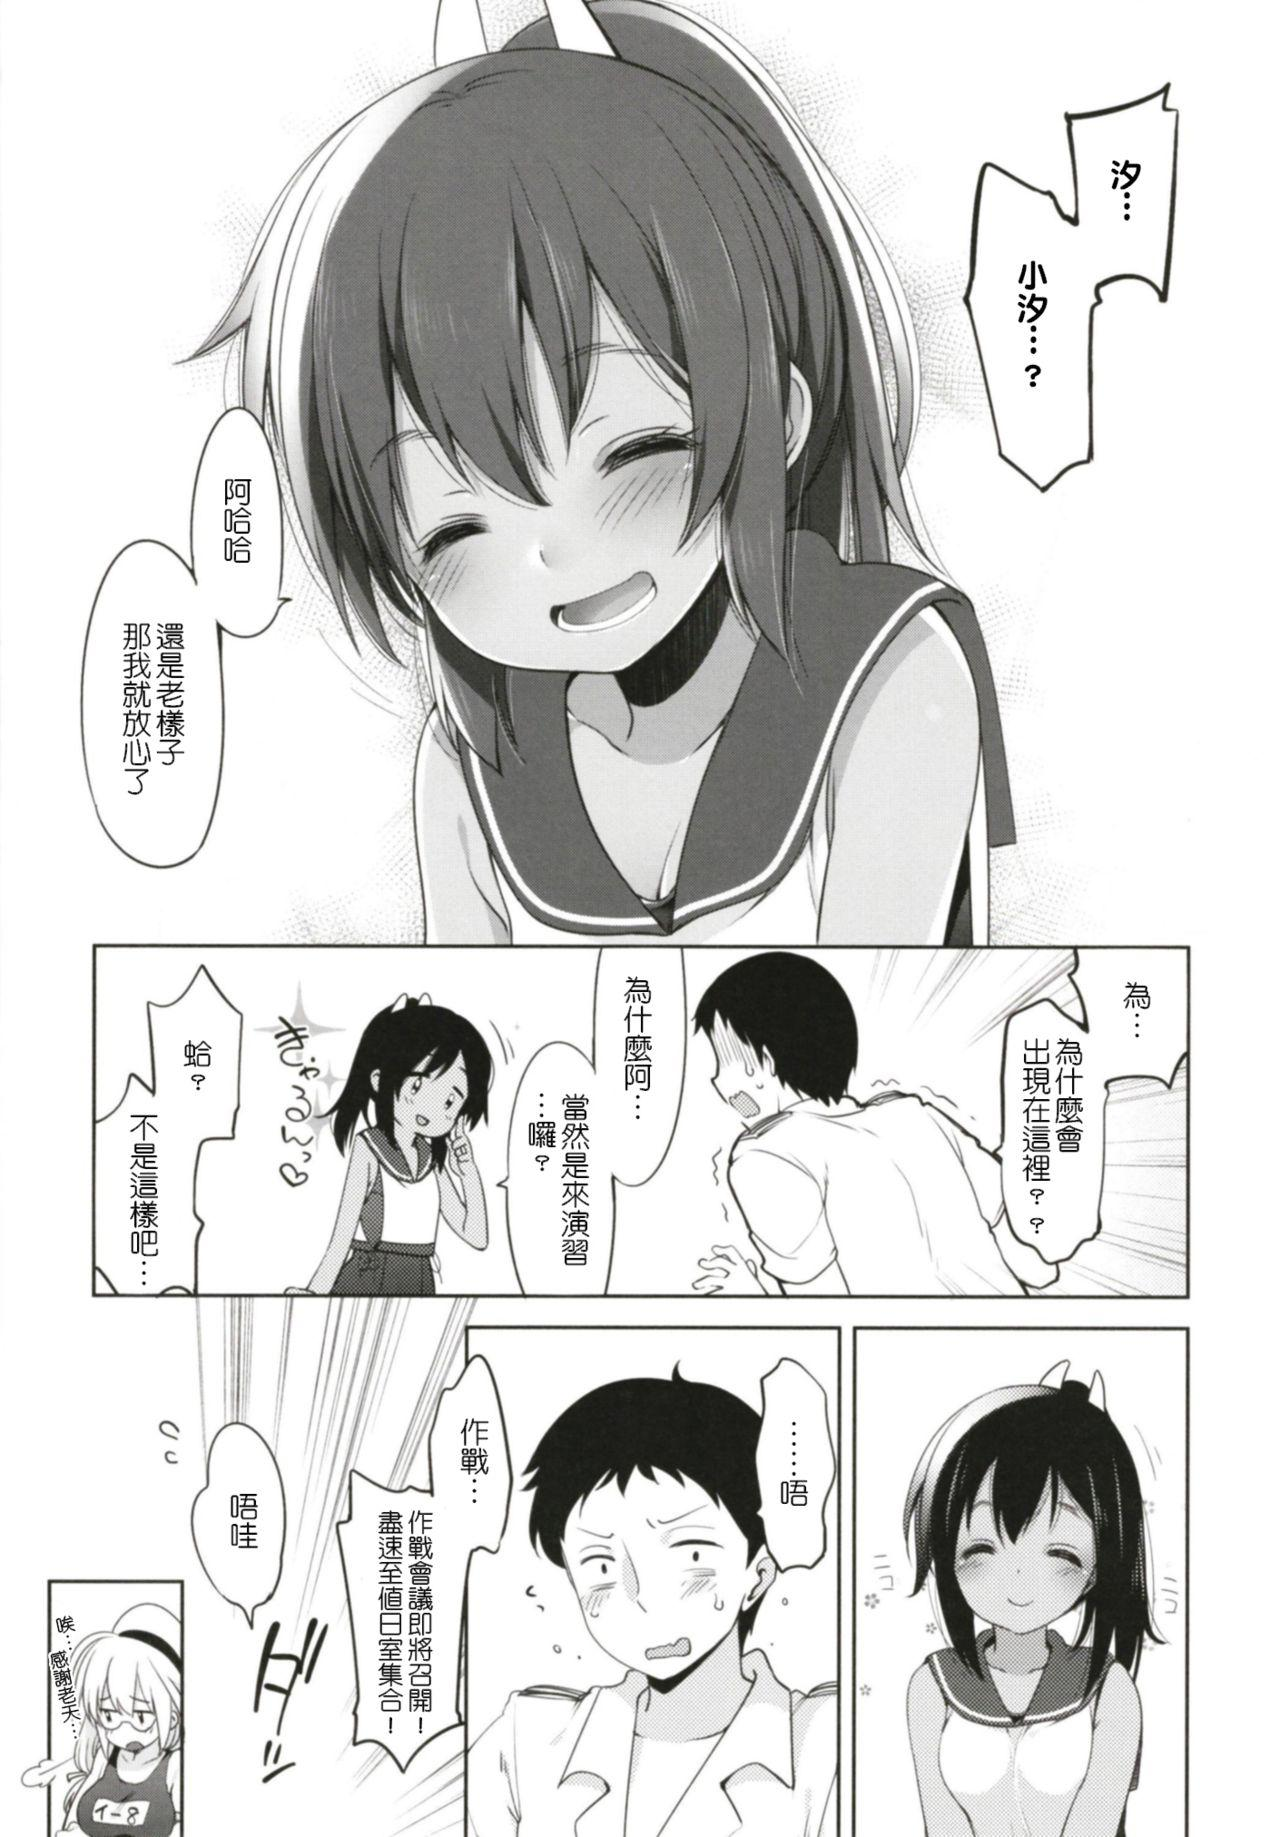 [French letter (Fujisaki Hikari)] Hitonatsu no Ayamachi -I-401 Soushuuhen- (Kantai Collection -KanColle-) [Chinese] [Digital] 36